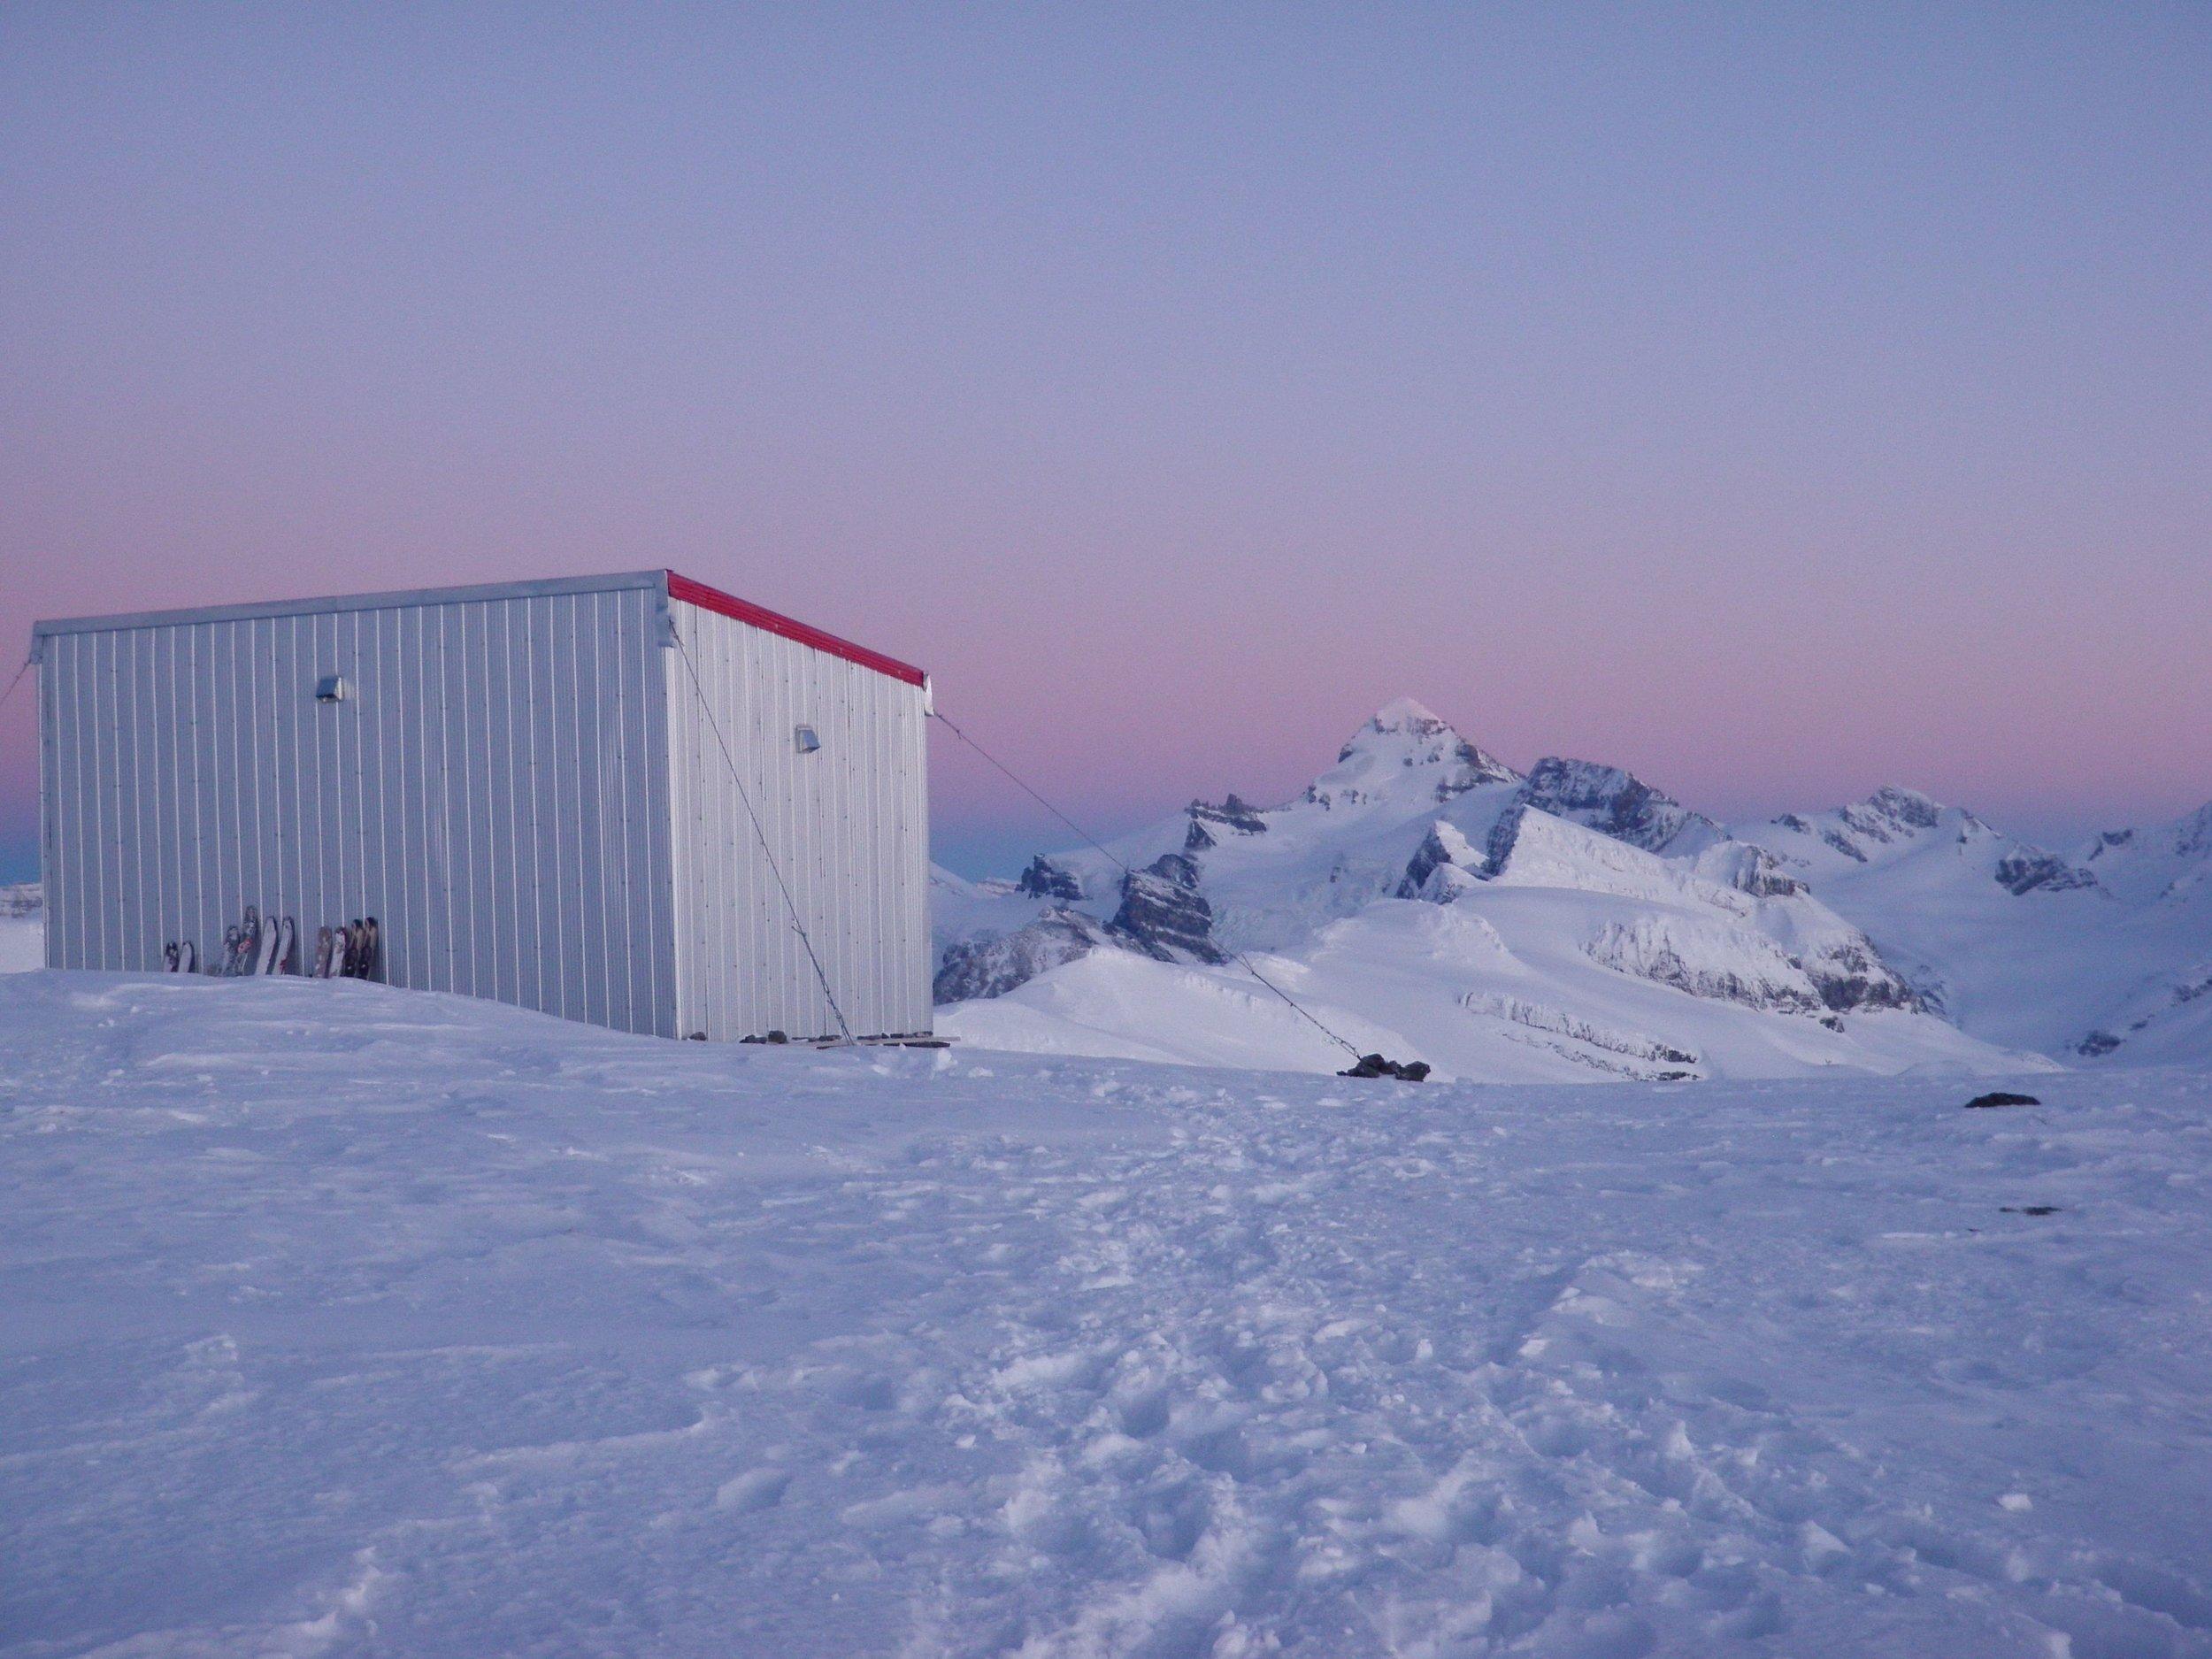 Icefall Feb 2012 019.jpg